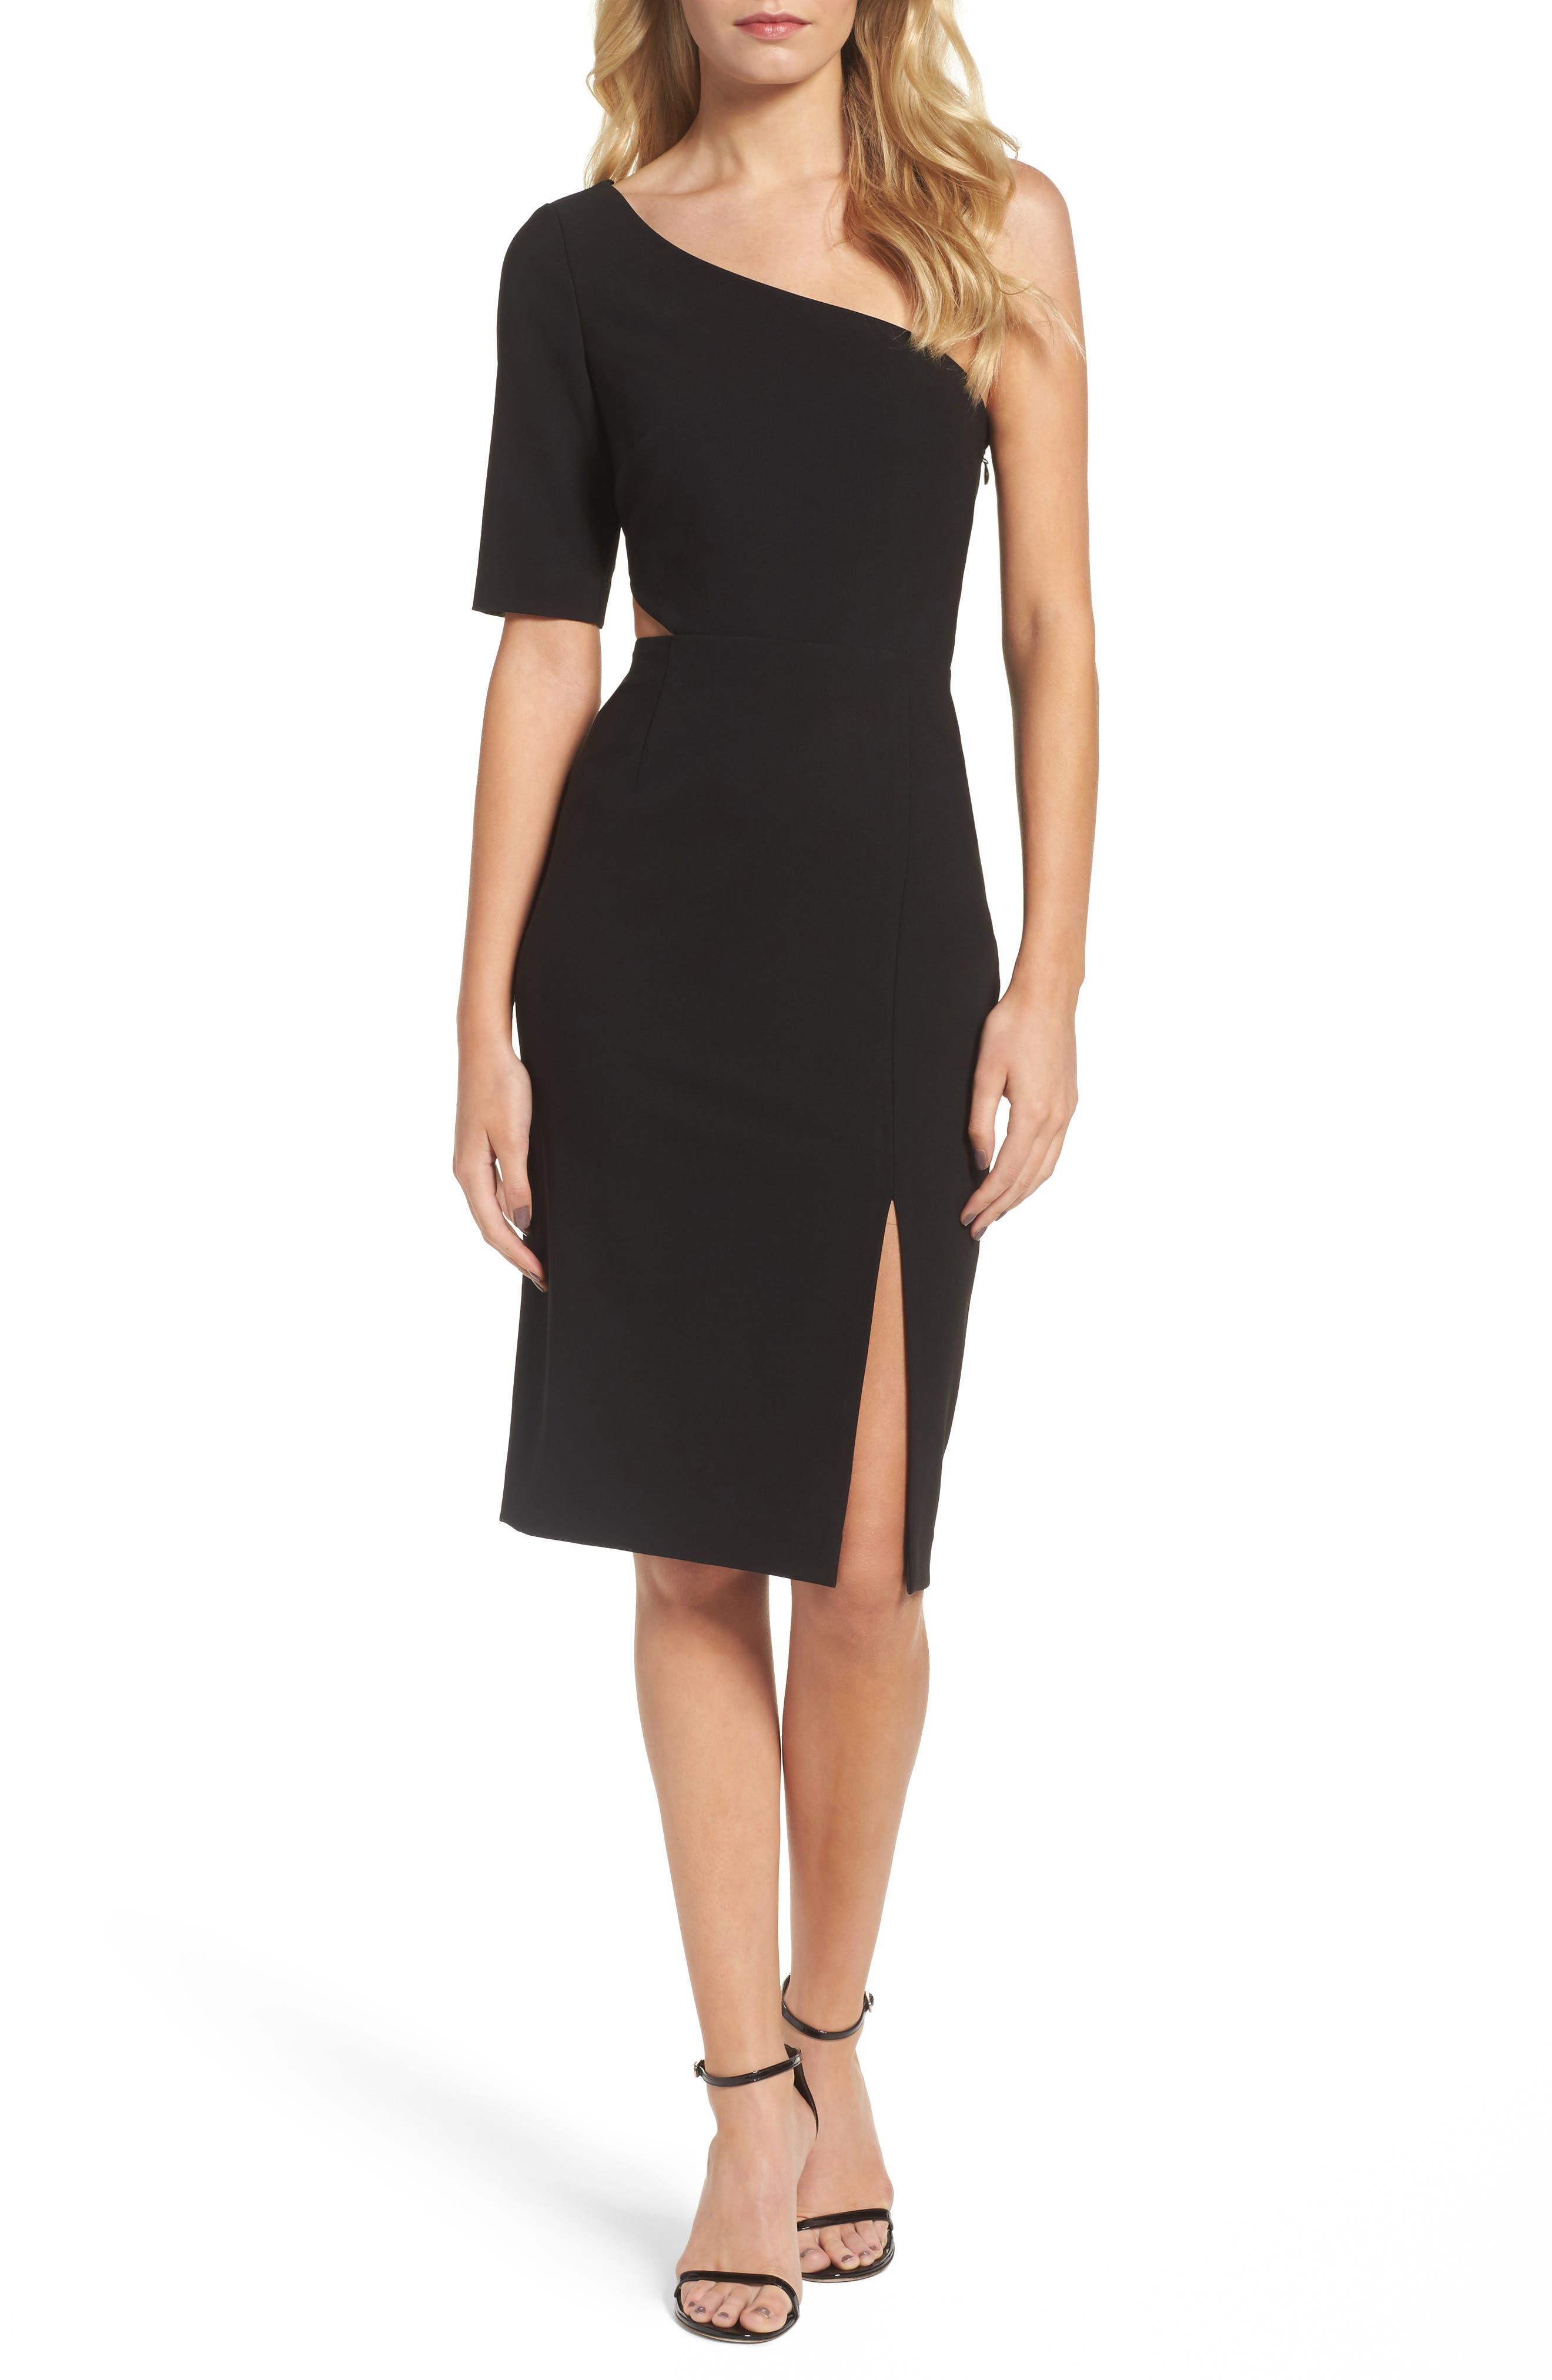 Alternate Image 1 Selected - Jill Jill Stuart One-Shoulder Sheath Dress